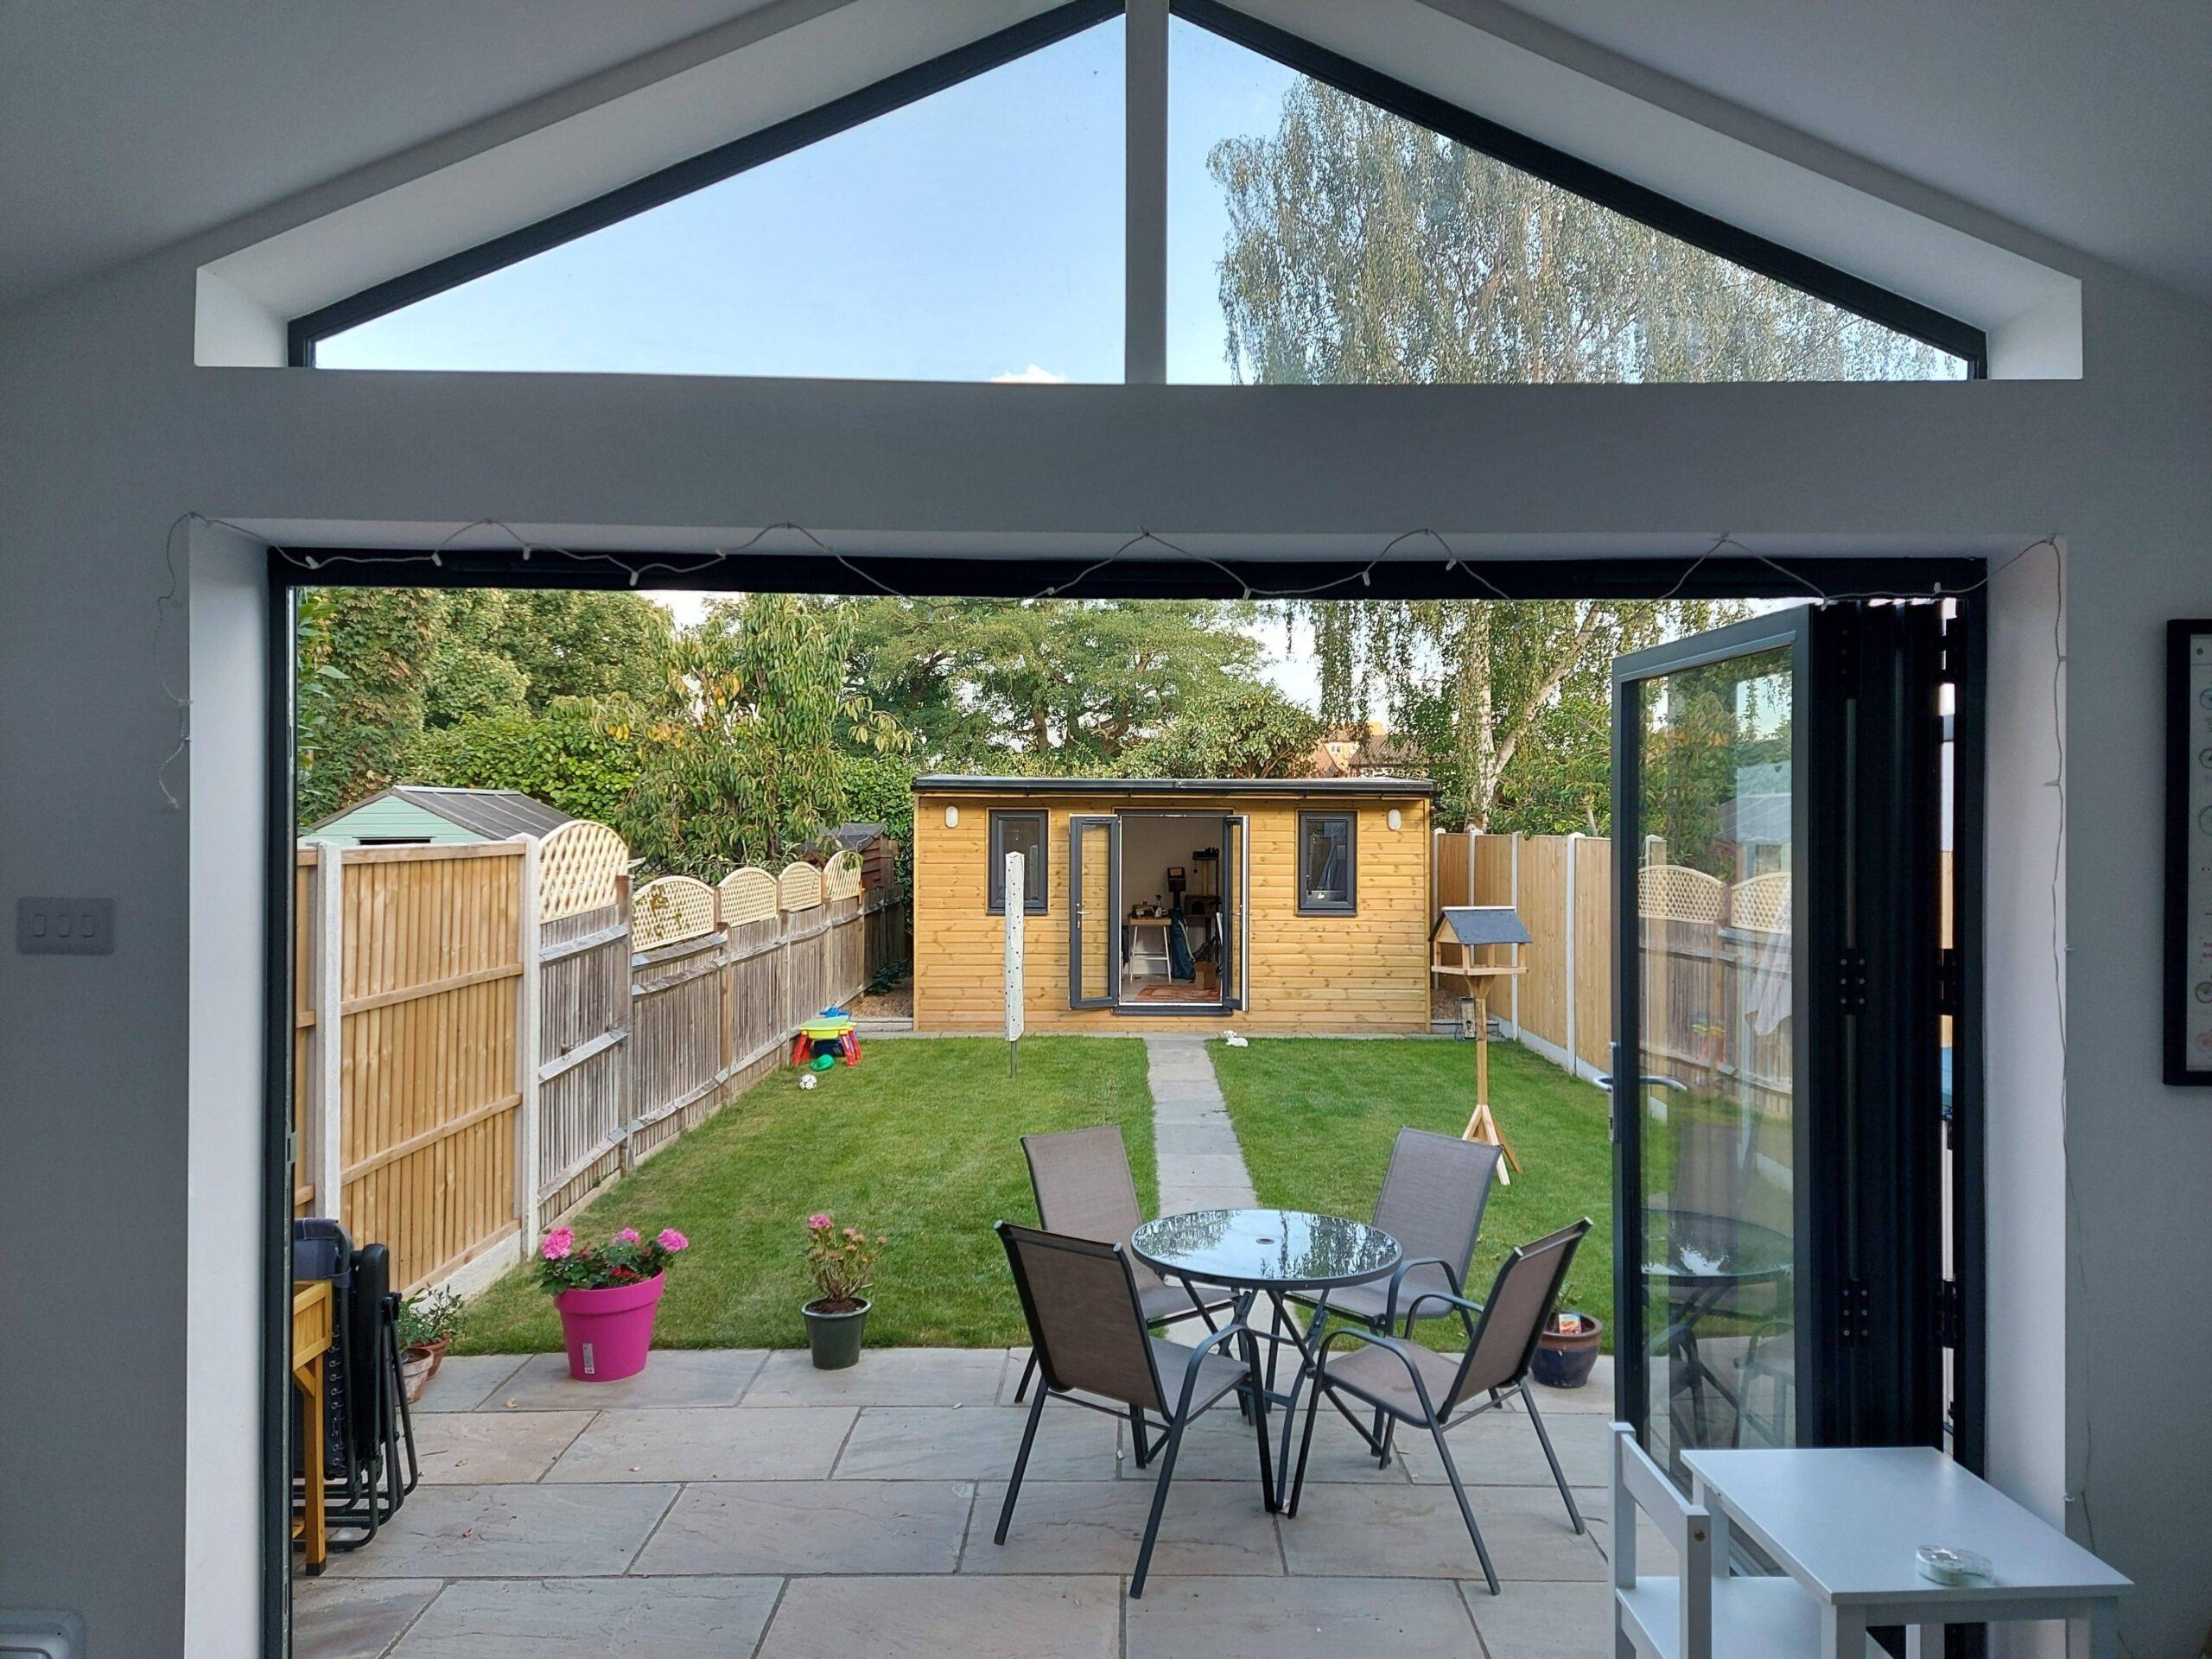 Kitchen Extension in Walton-on-Thames